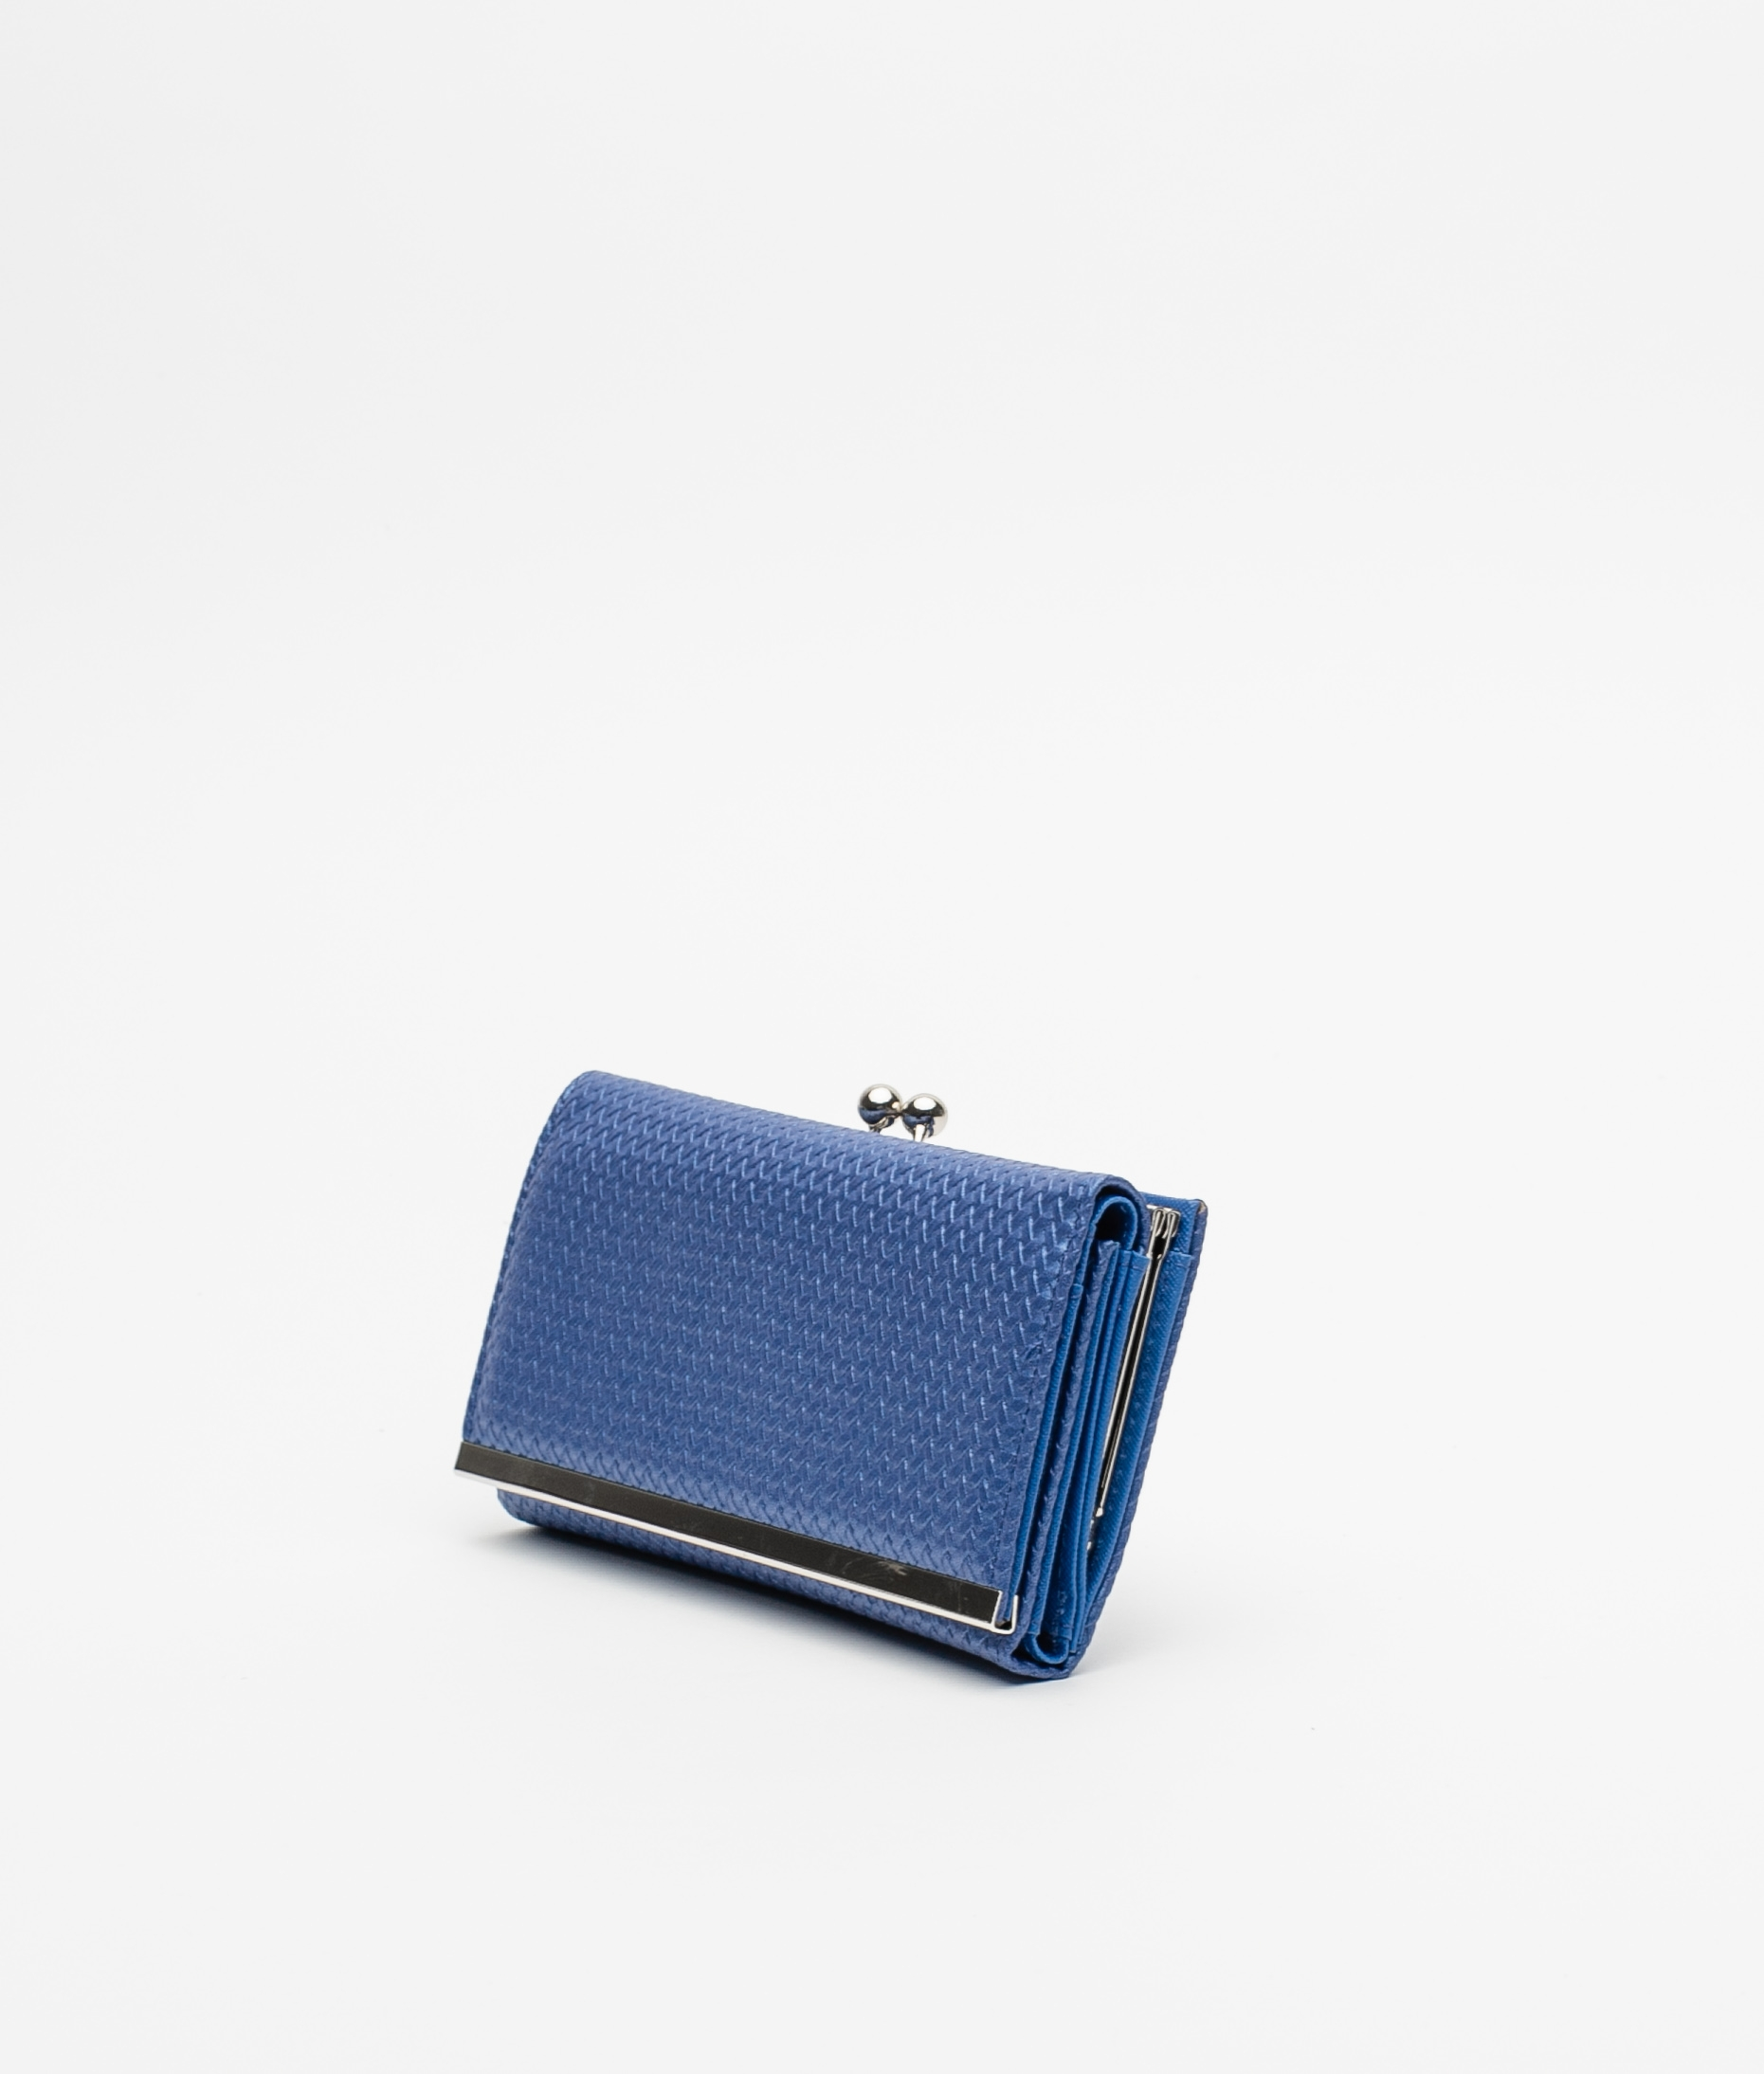 CARLIE PURSE - BLUE